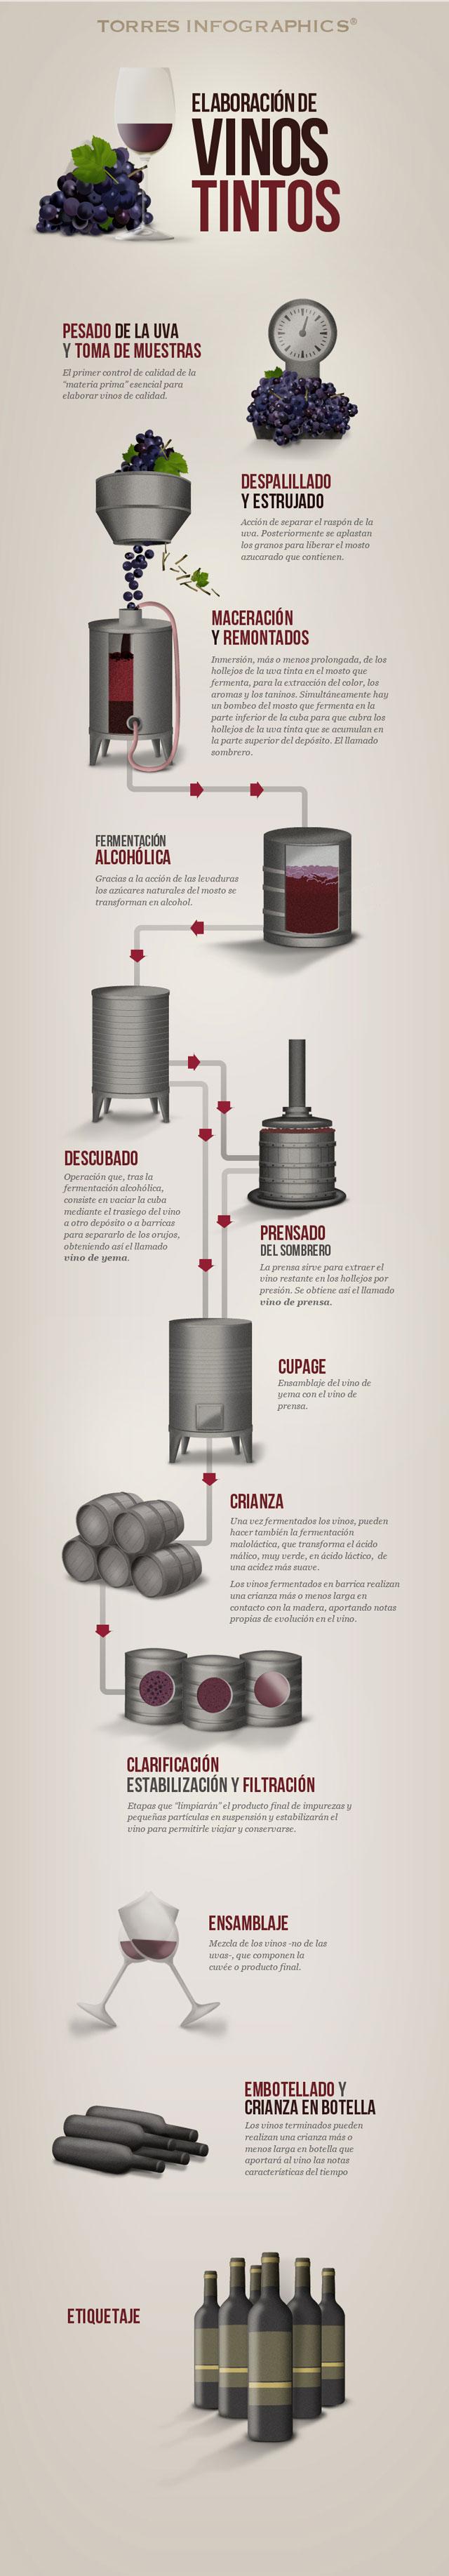 Waltraud Vino Vinos Torres Pinterest Torre Y Mapas